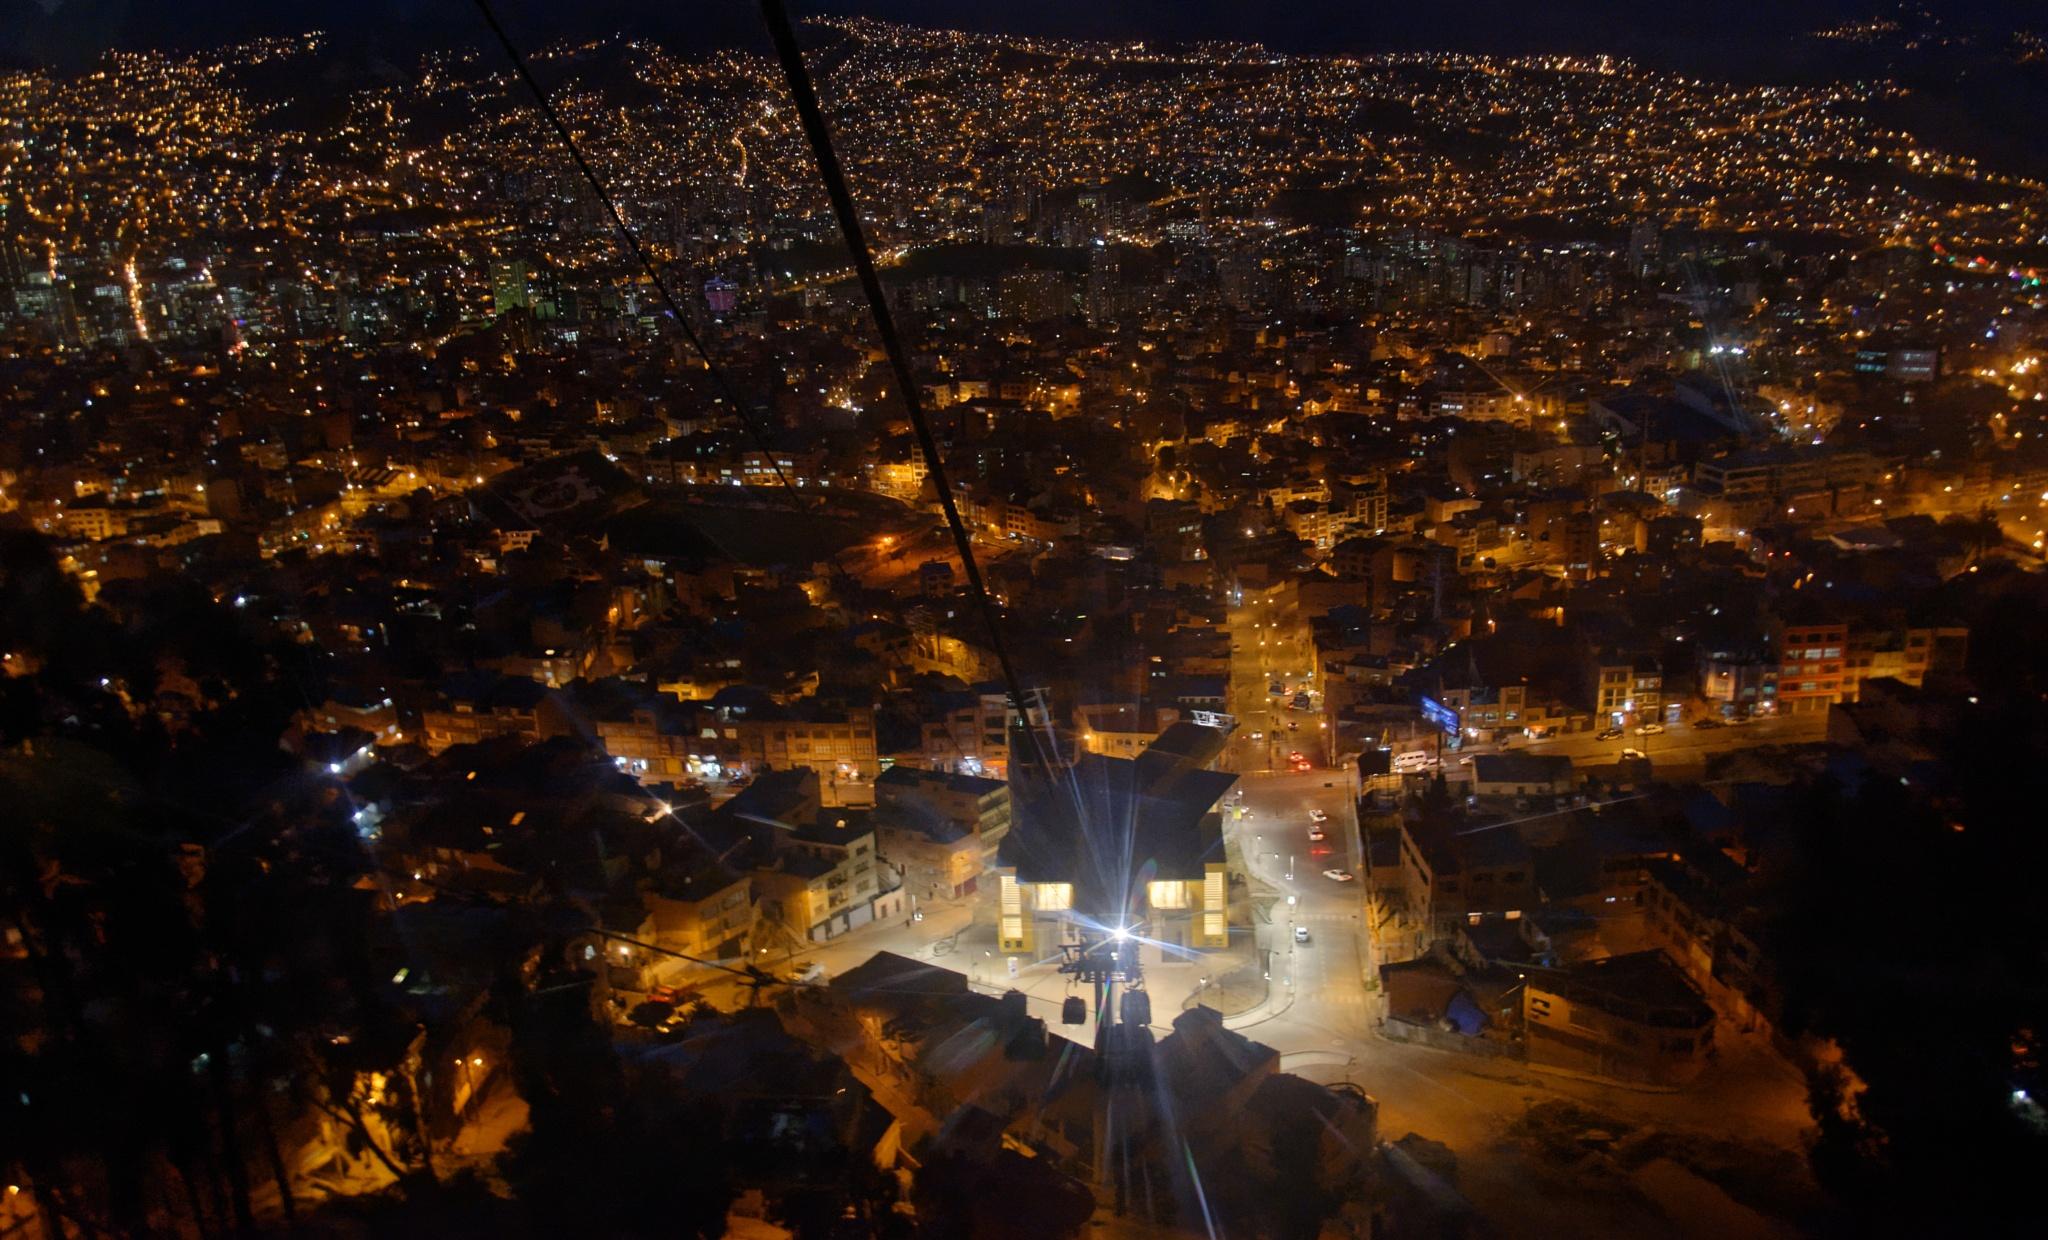 Del Alto a La Paz by Cristian Araya